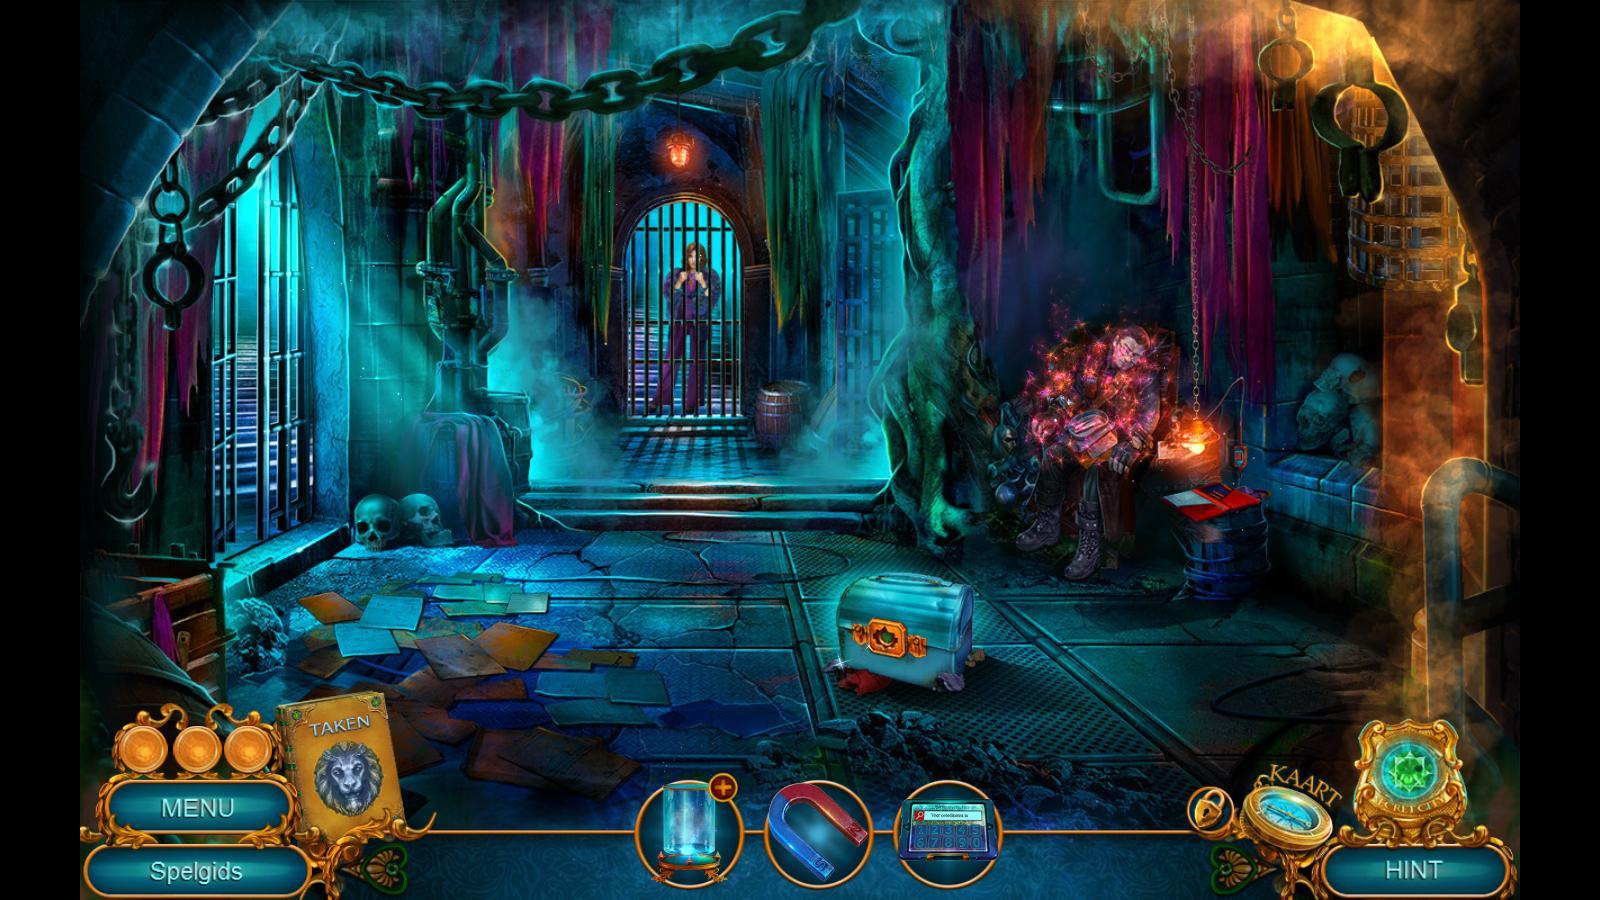 Secret City - The Human Threat - Speel leuke spelletjes